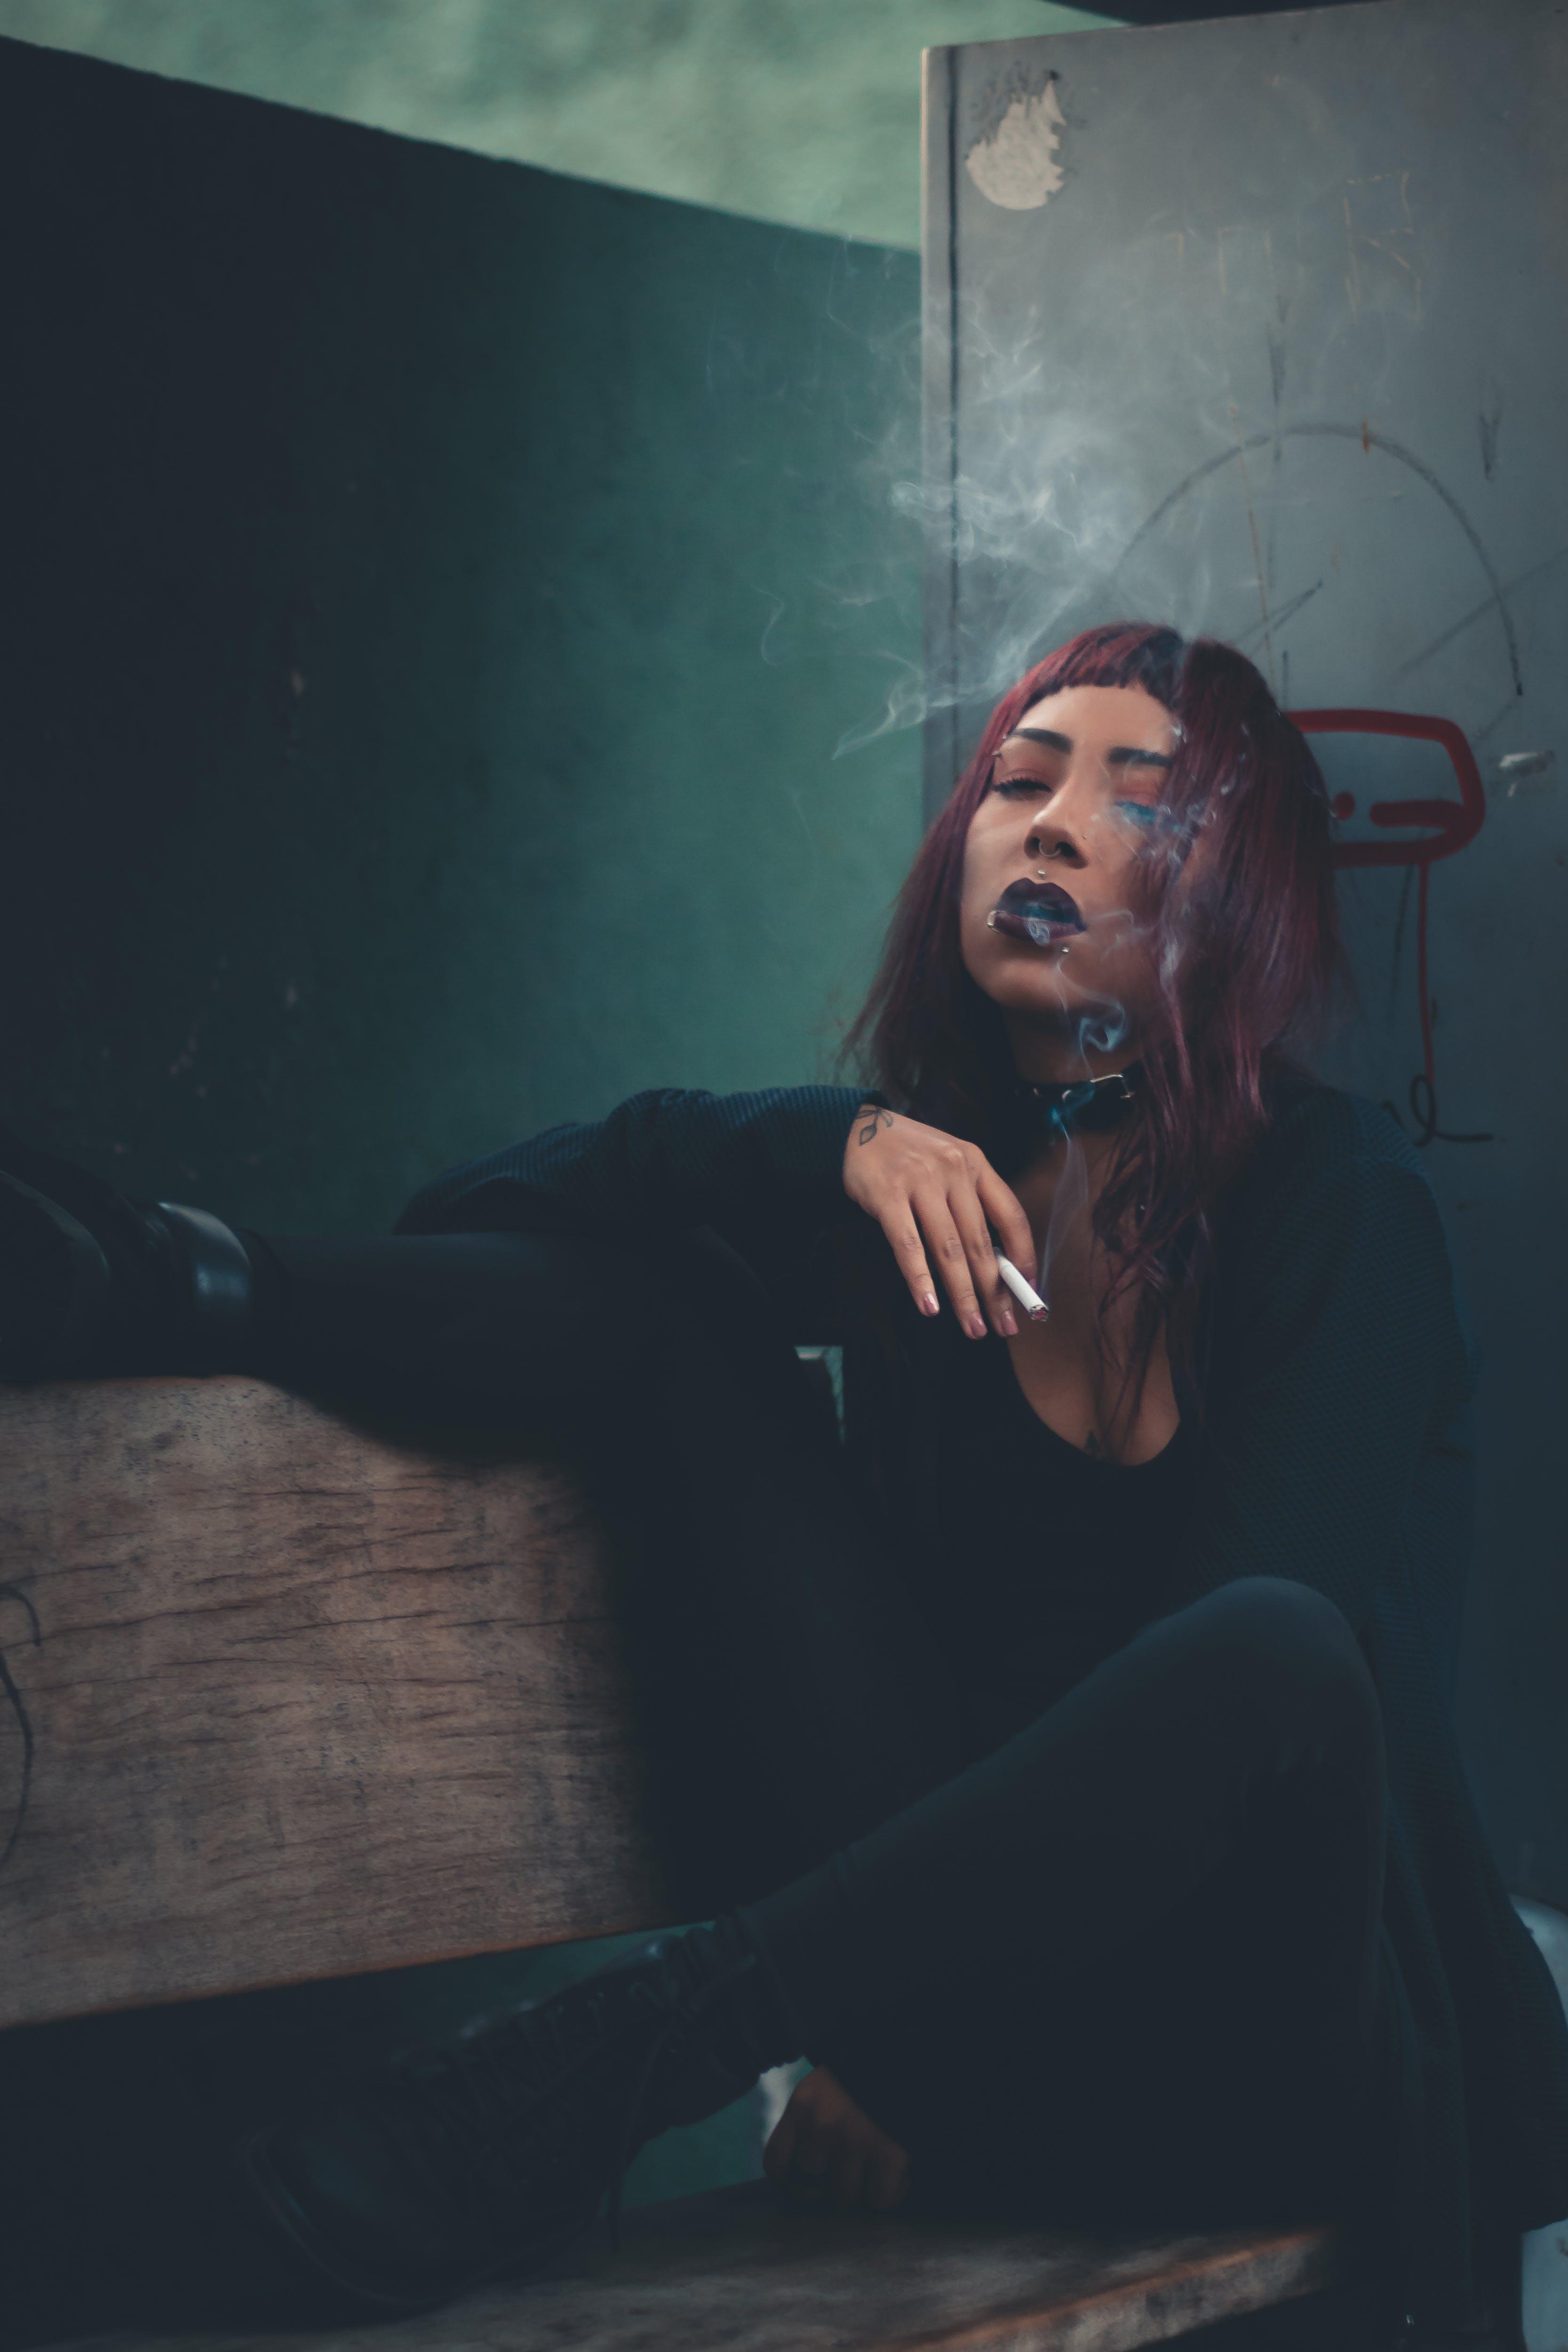 Woman in Black Shirt Sitting and Smoking